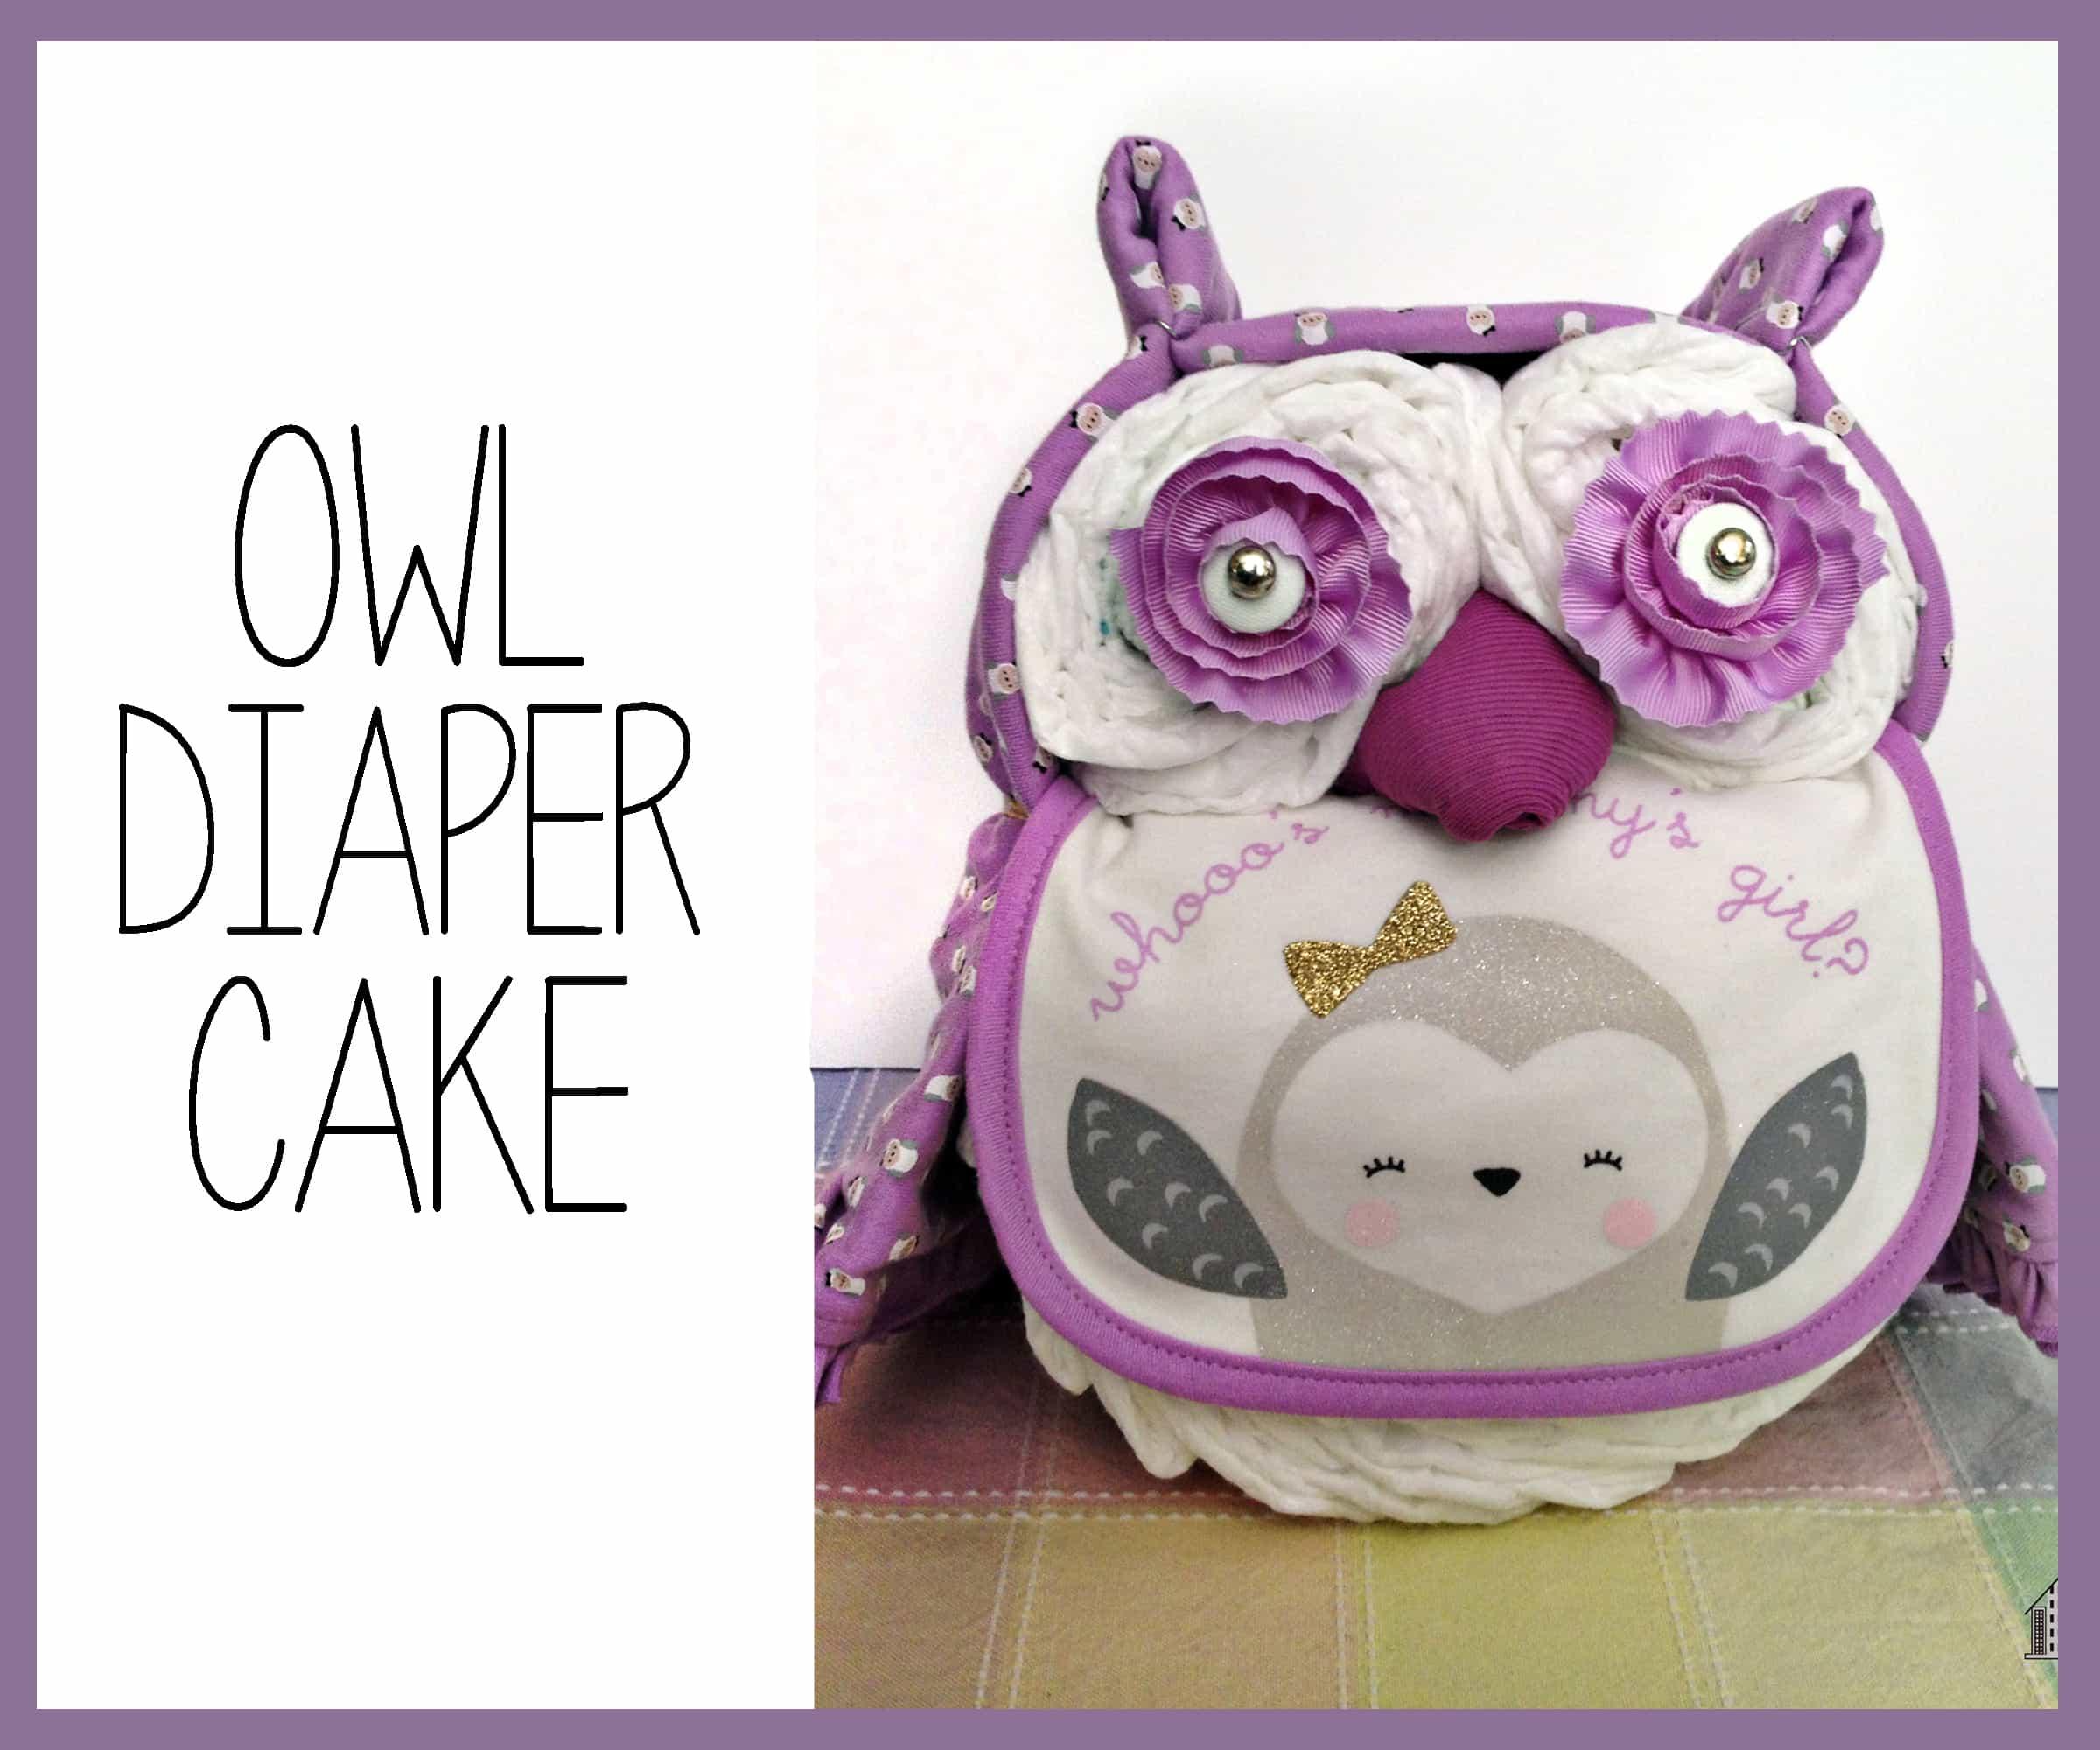 OWLdiapercake